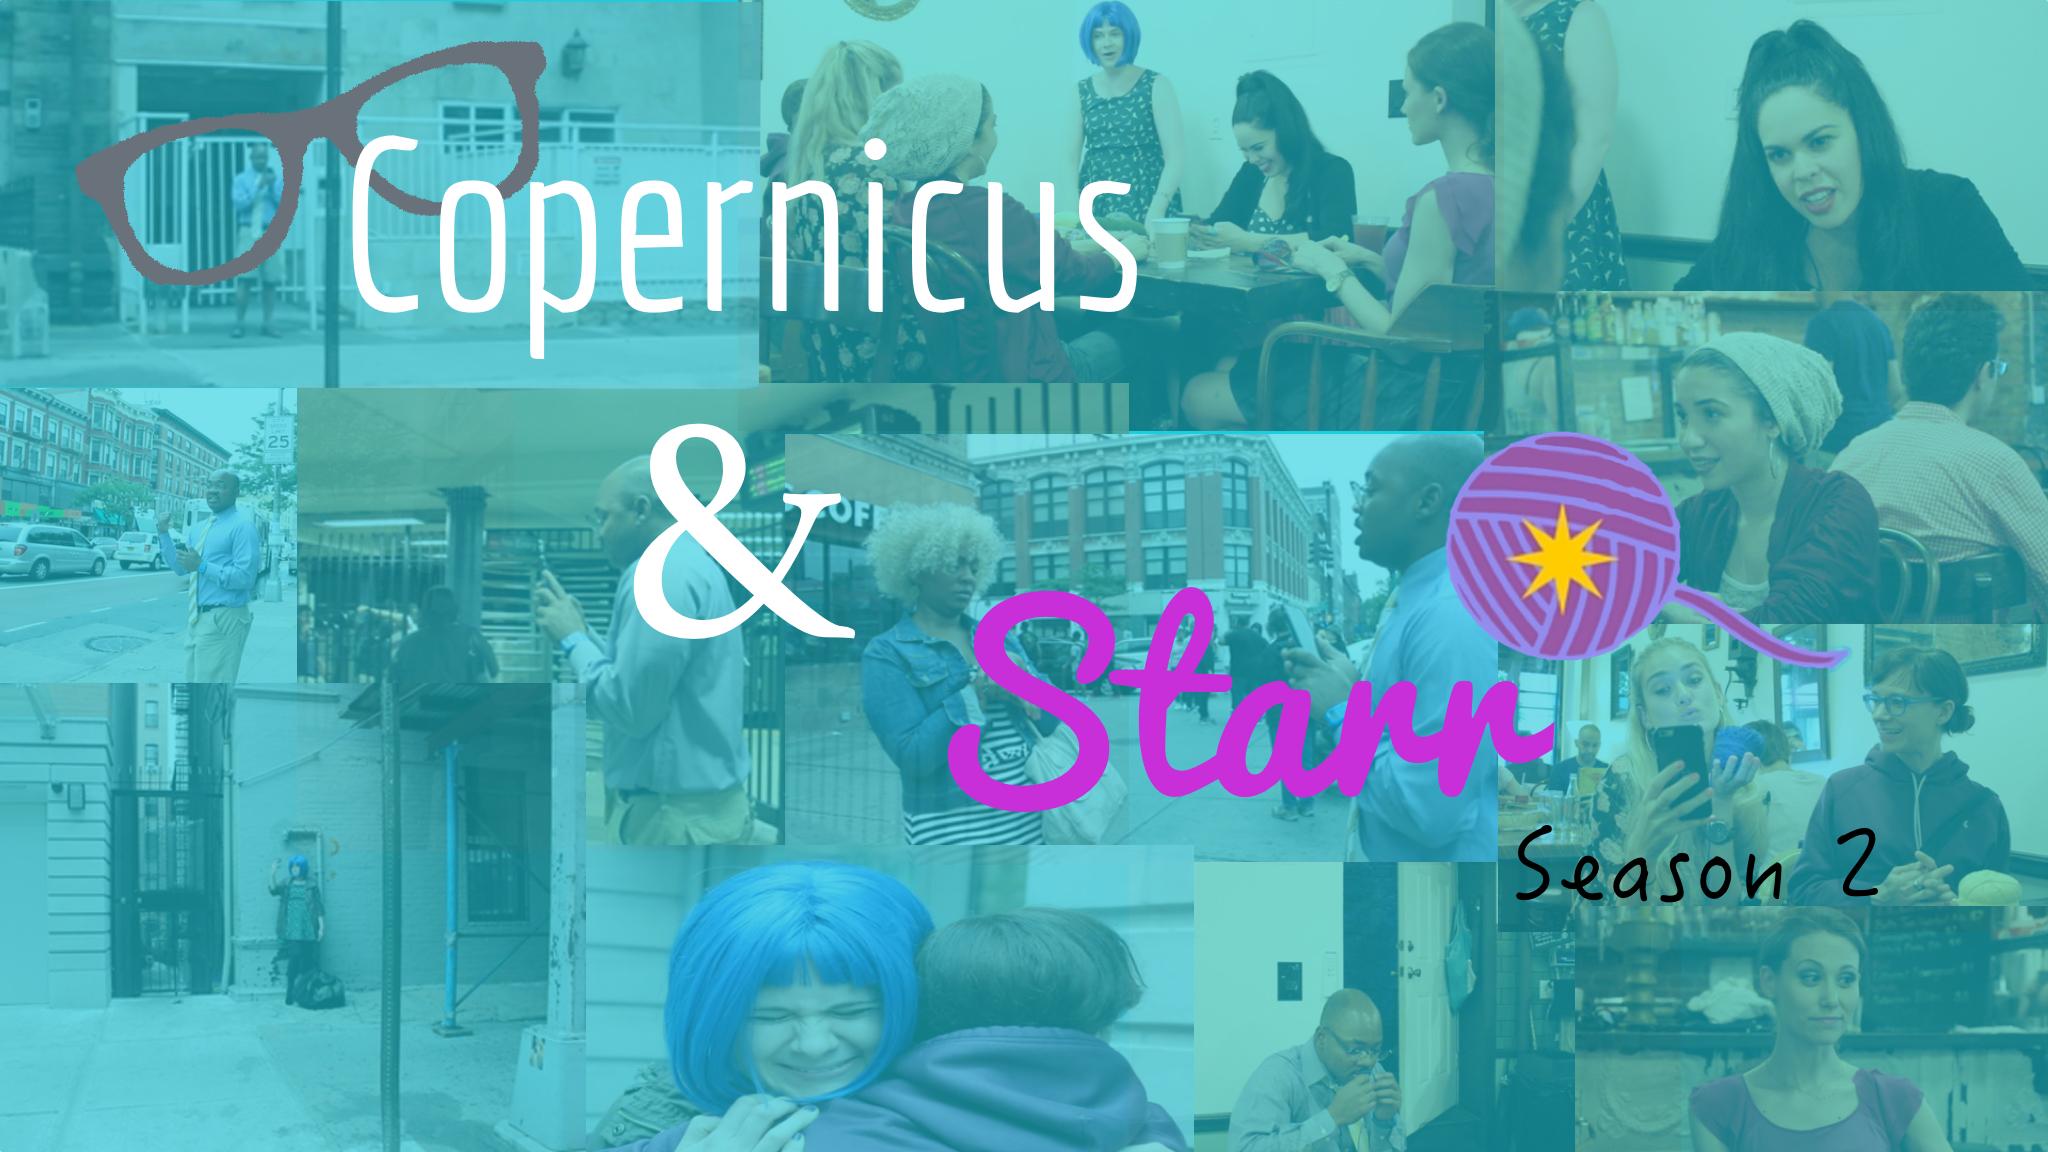 Copernicus and Starr Season 2 Card big.jpg